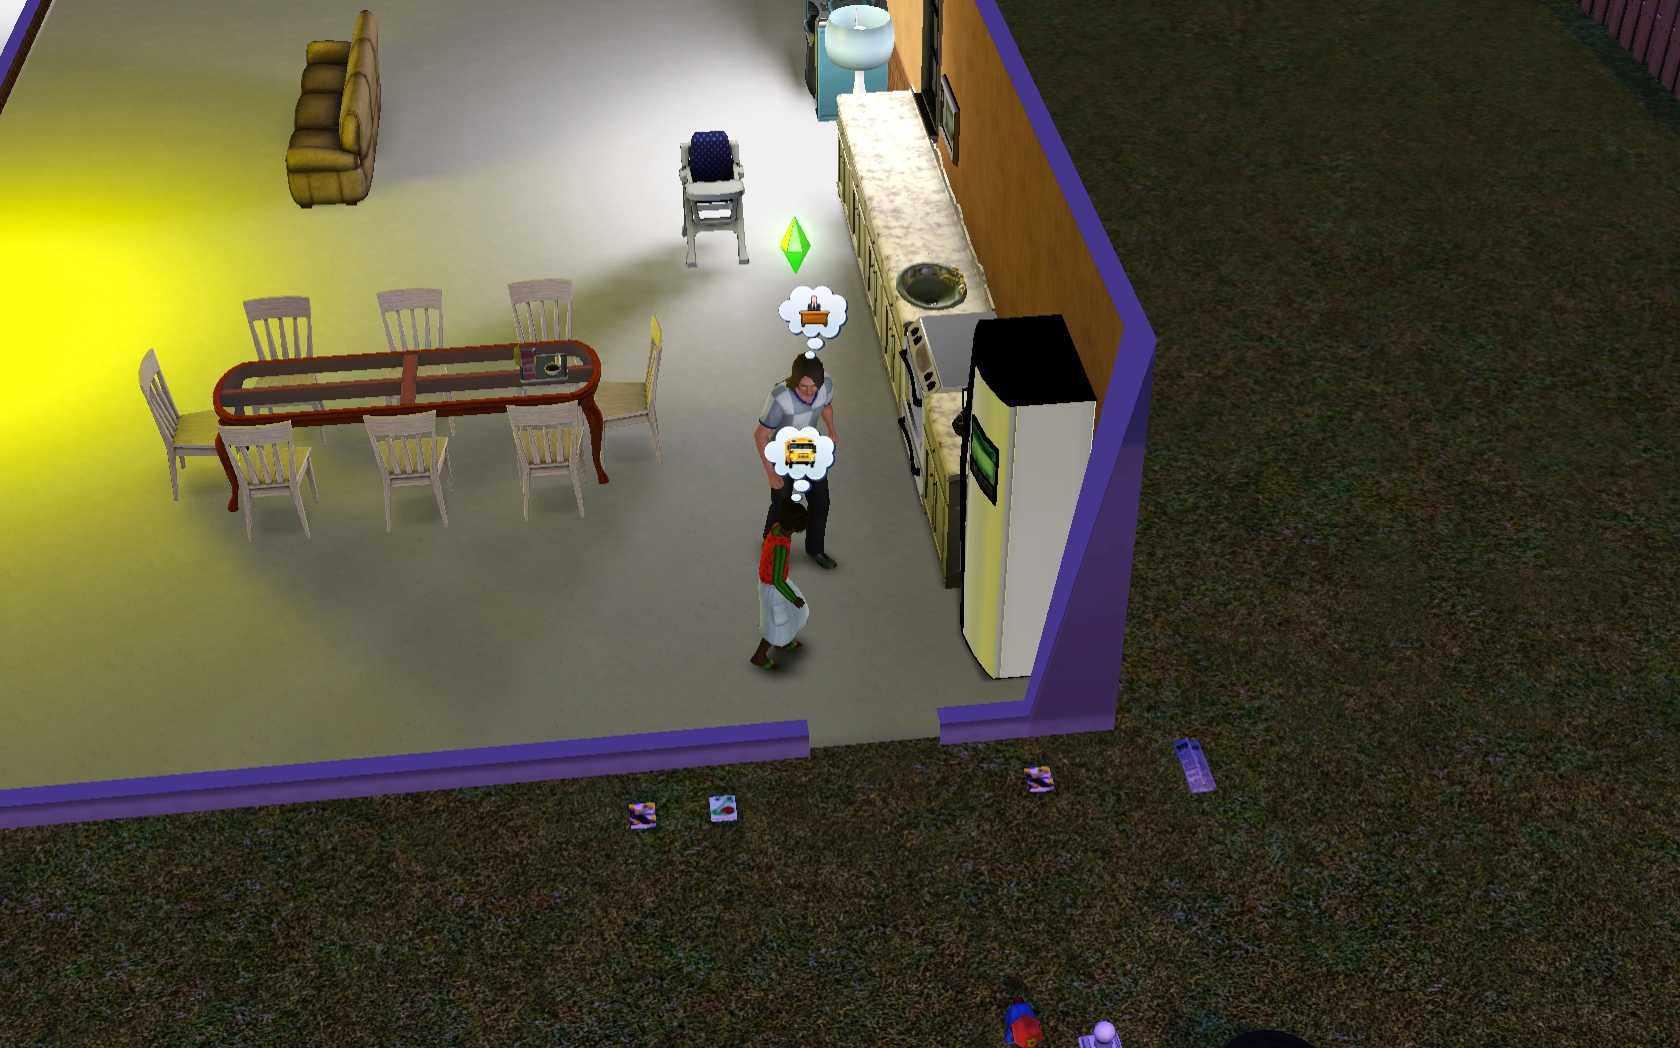 Do homework sims 3 xbox